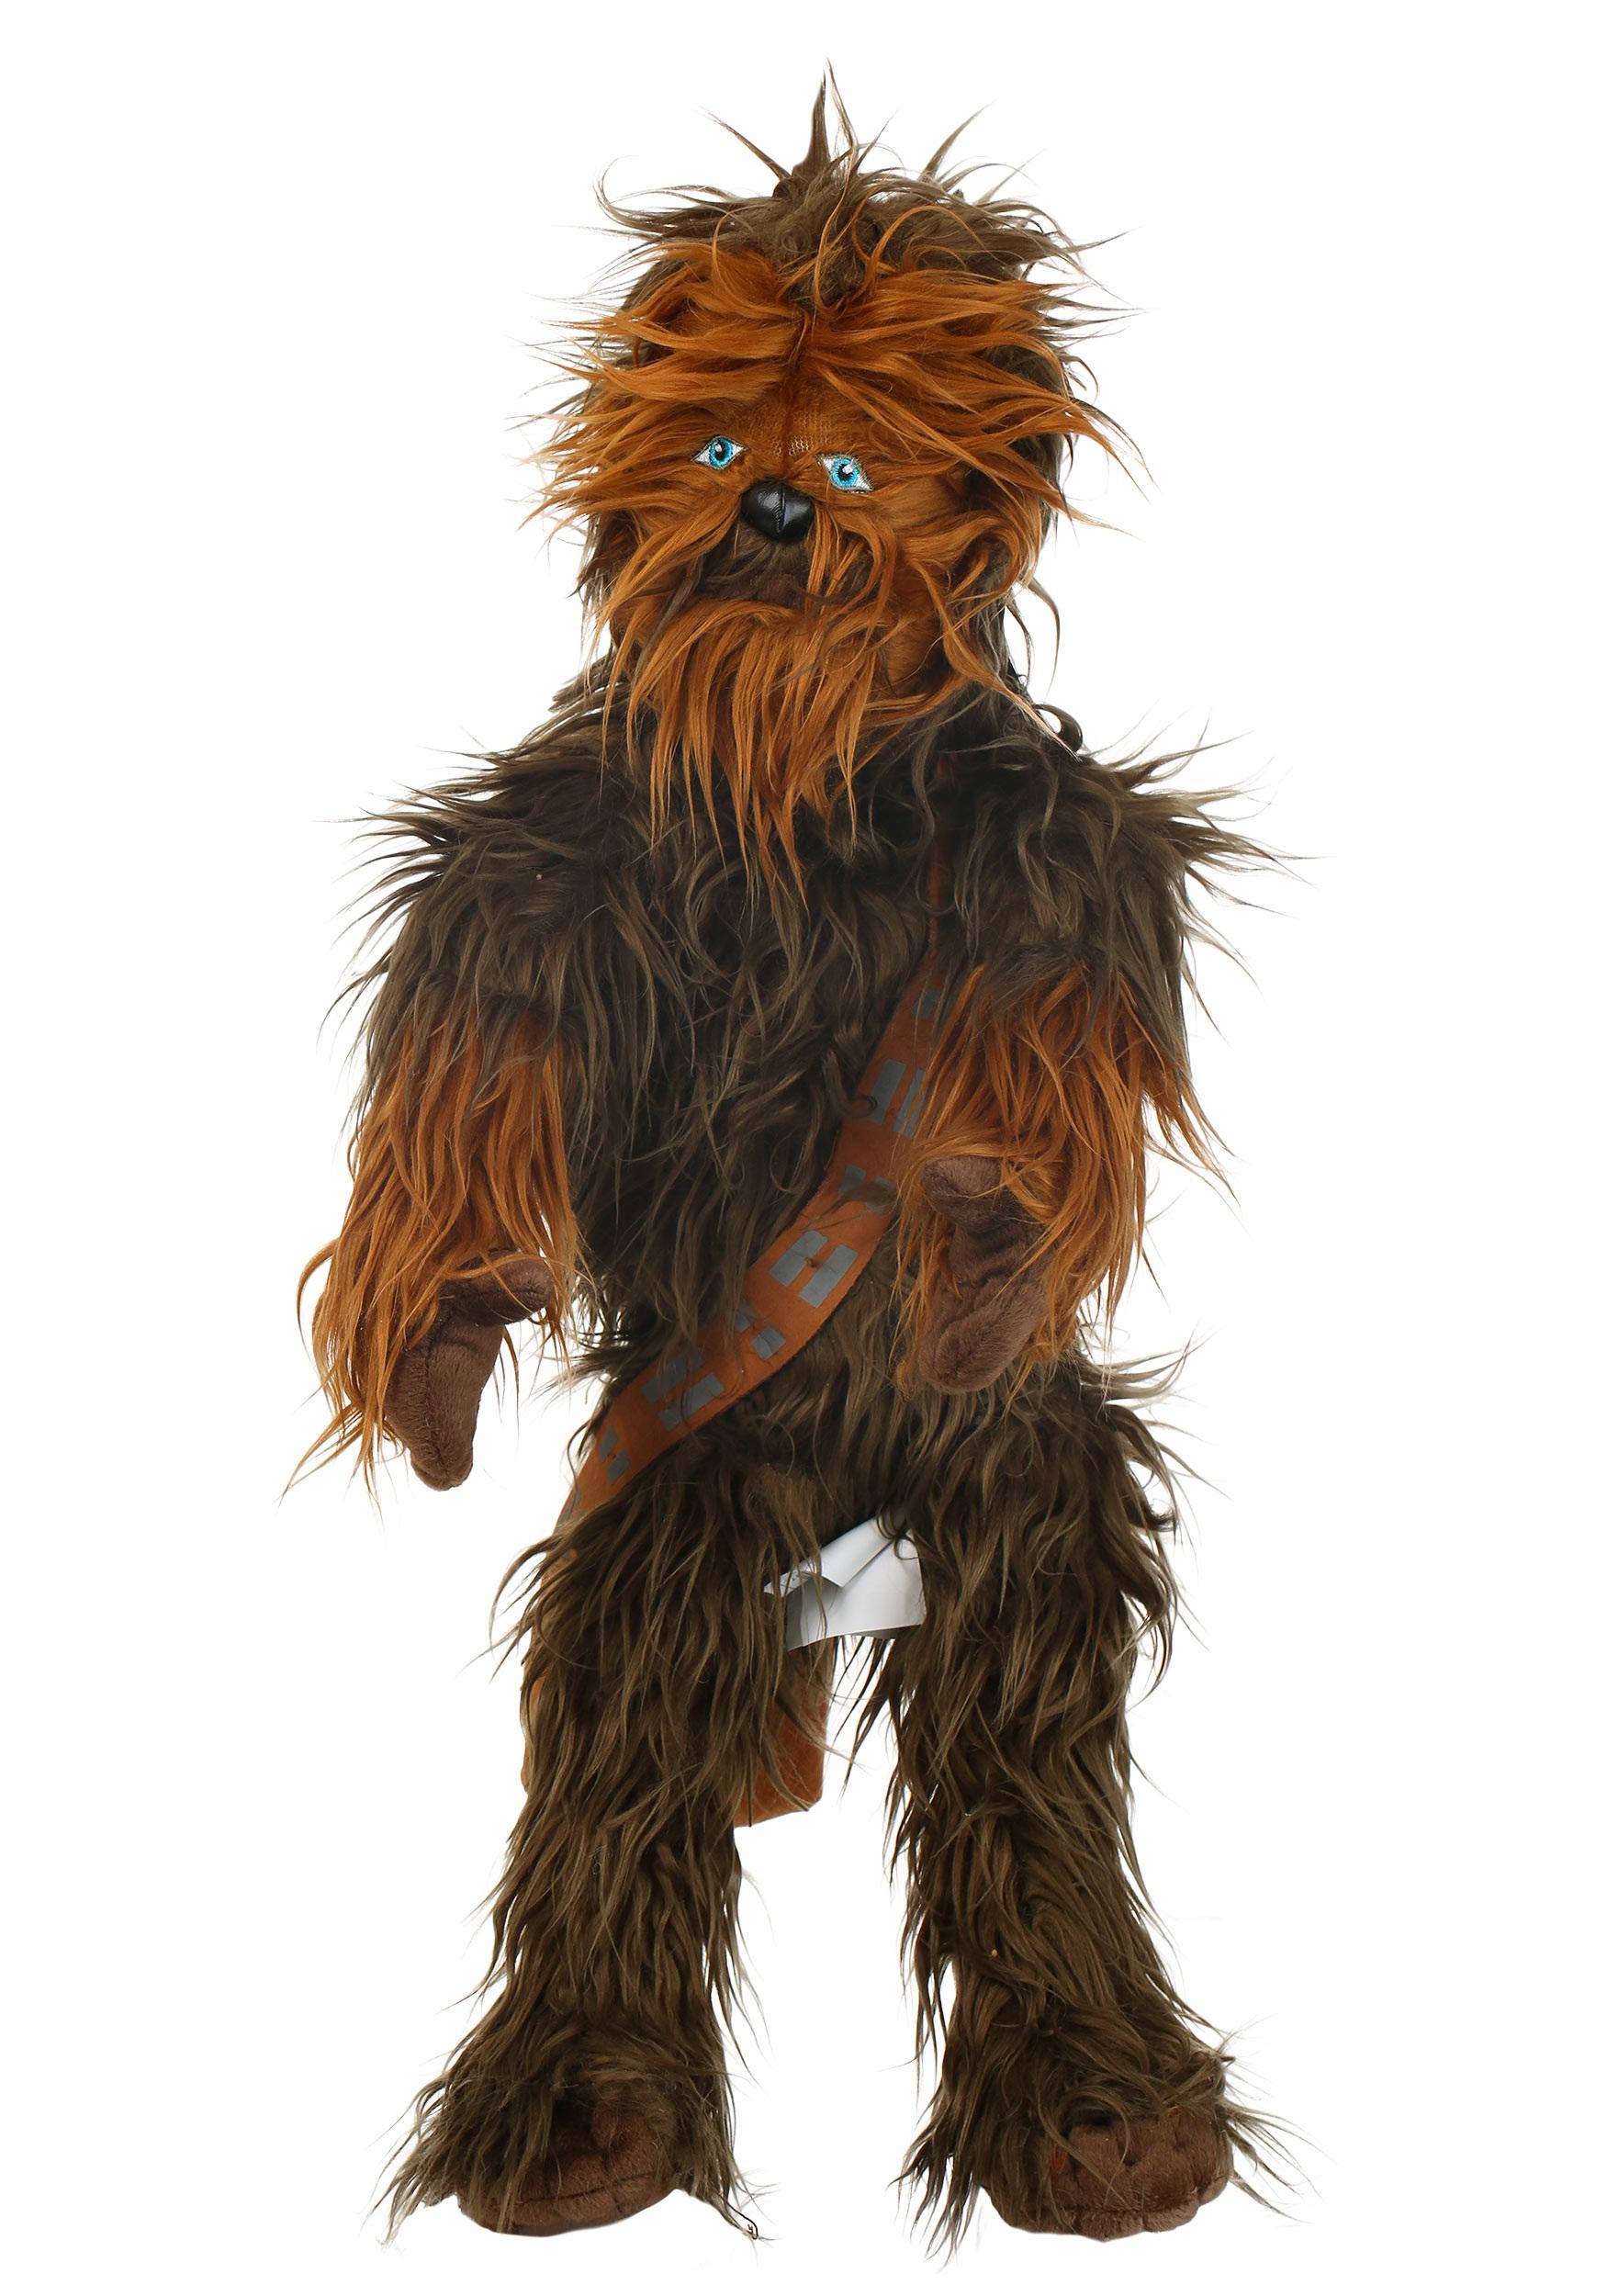 Star Wars Chewbacca Pillow Buddy